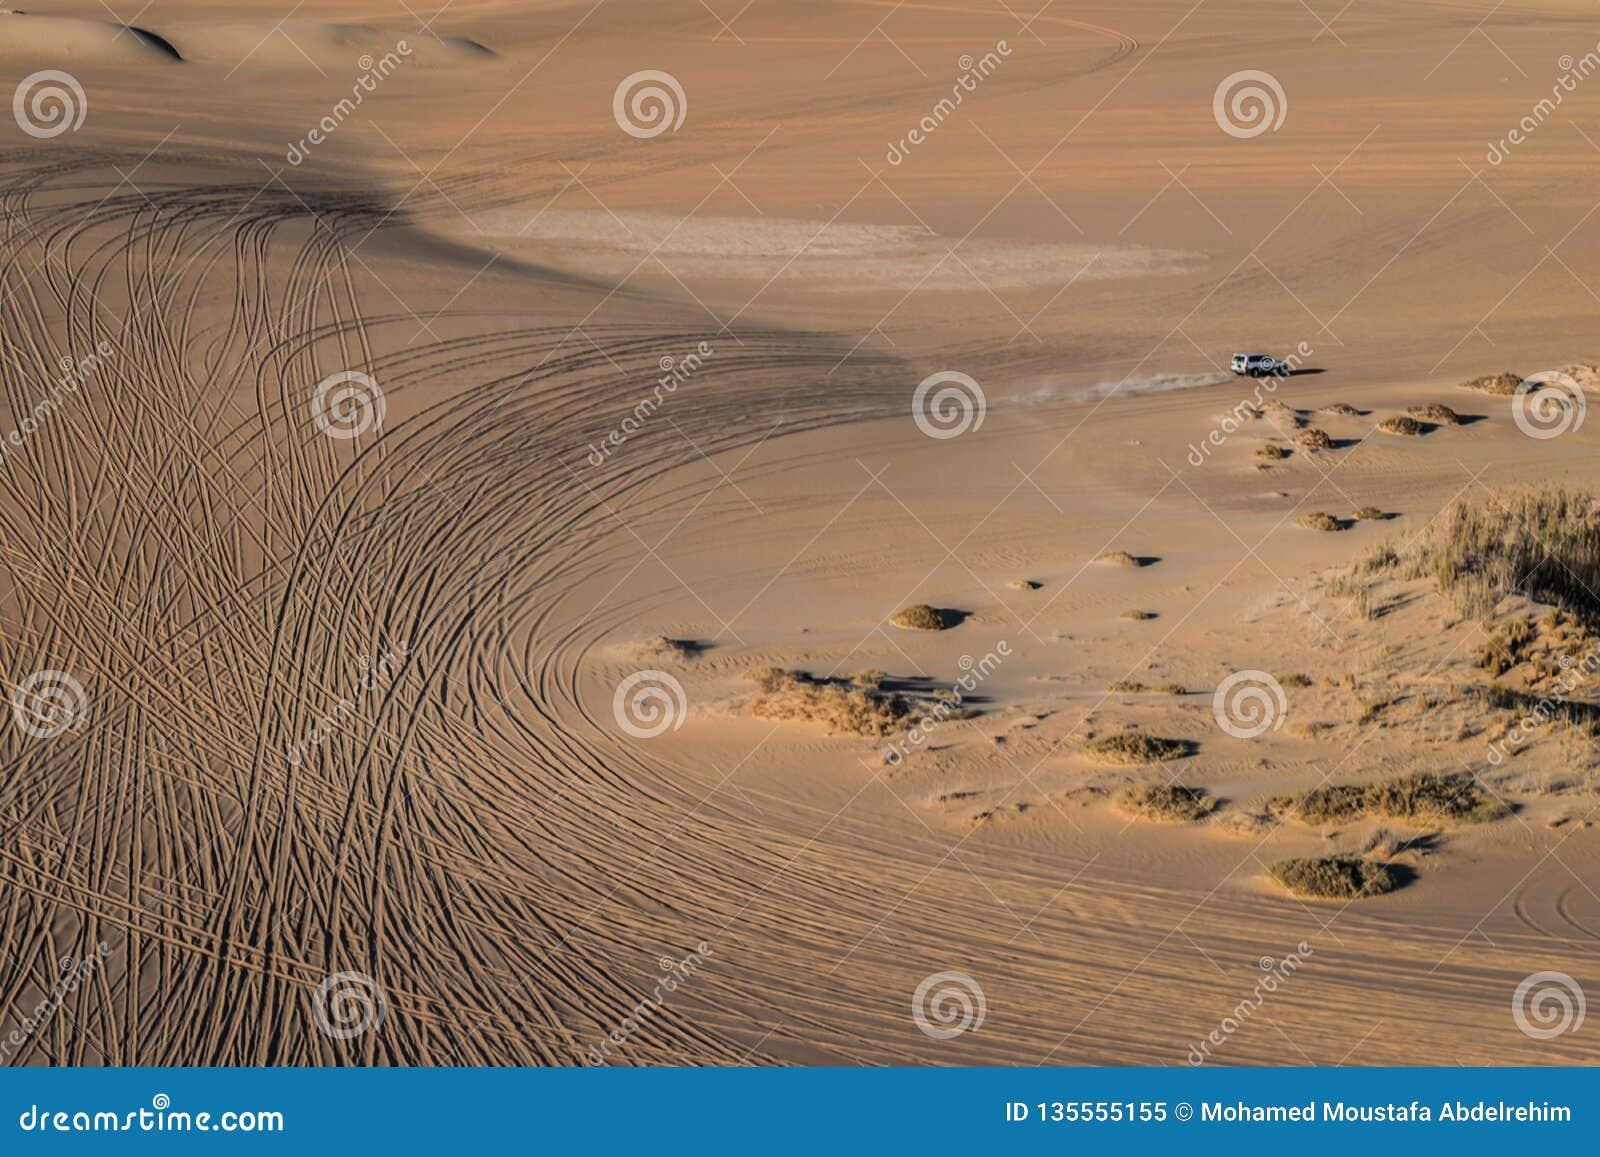 Safarireise in Siwa-Wüste, Ägypten